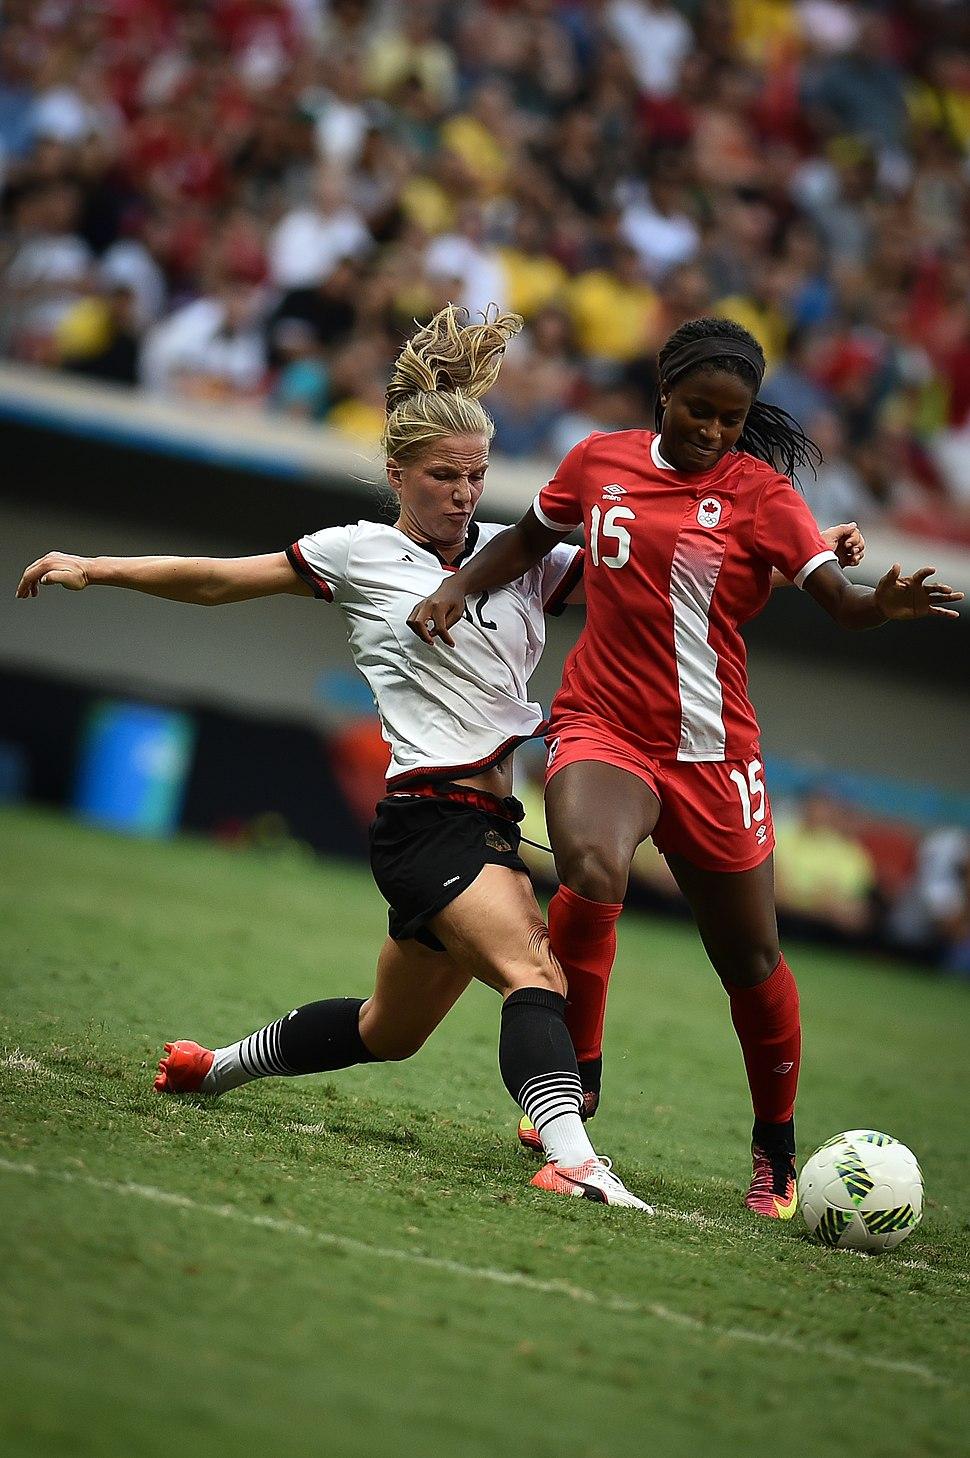 Alemanha x Canadá - Futebol feminino - Olimpíadas Rio 2016 (28774124982)